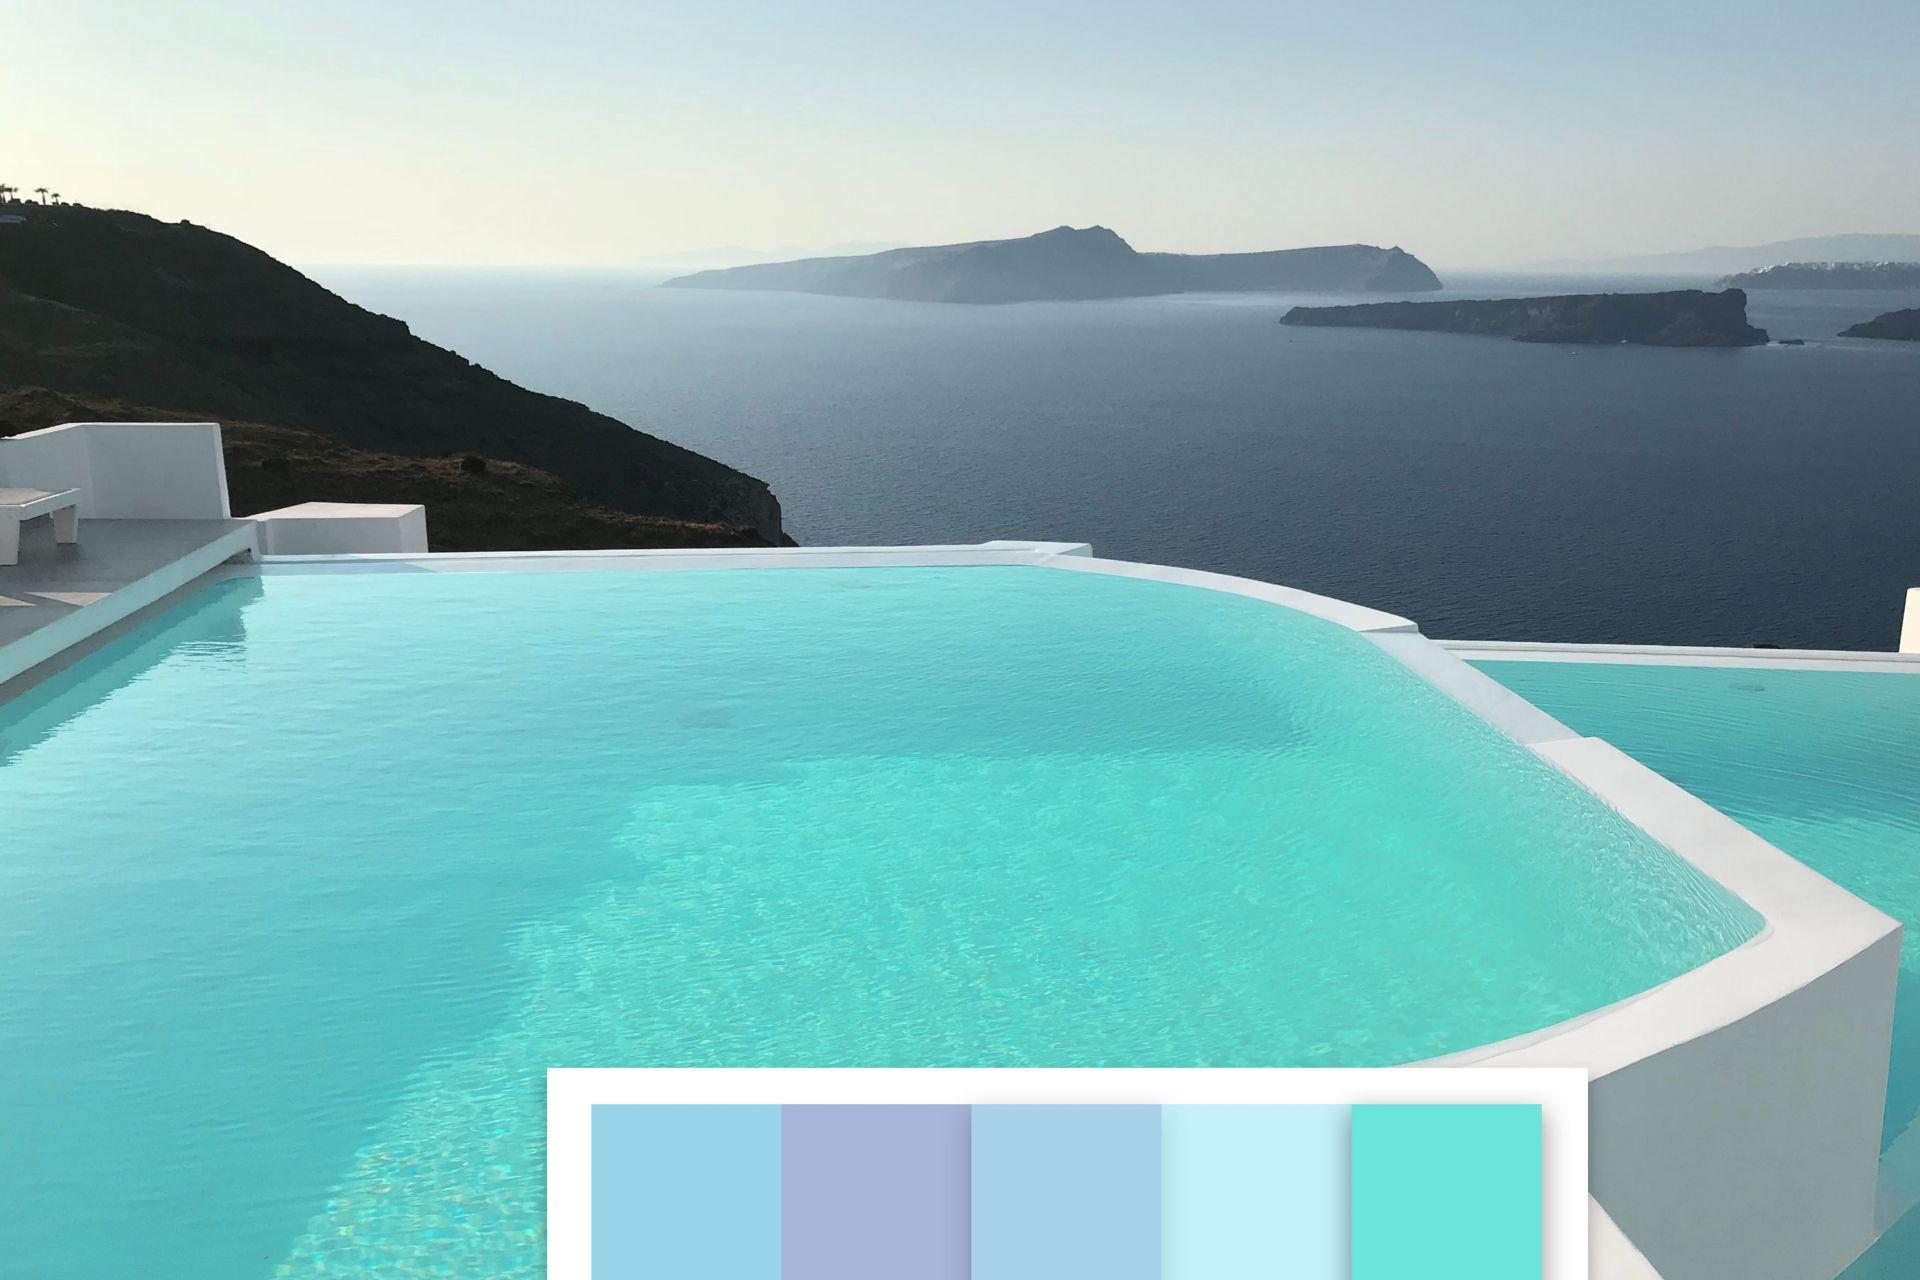 Vista piscina pigmento verde acqua